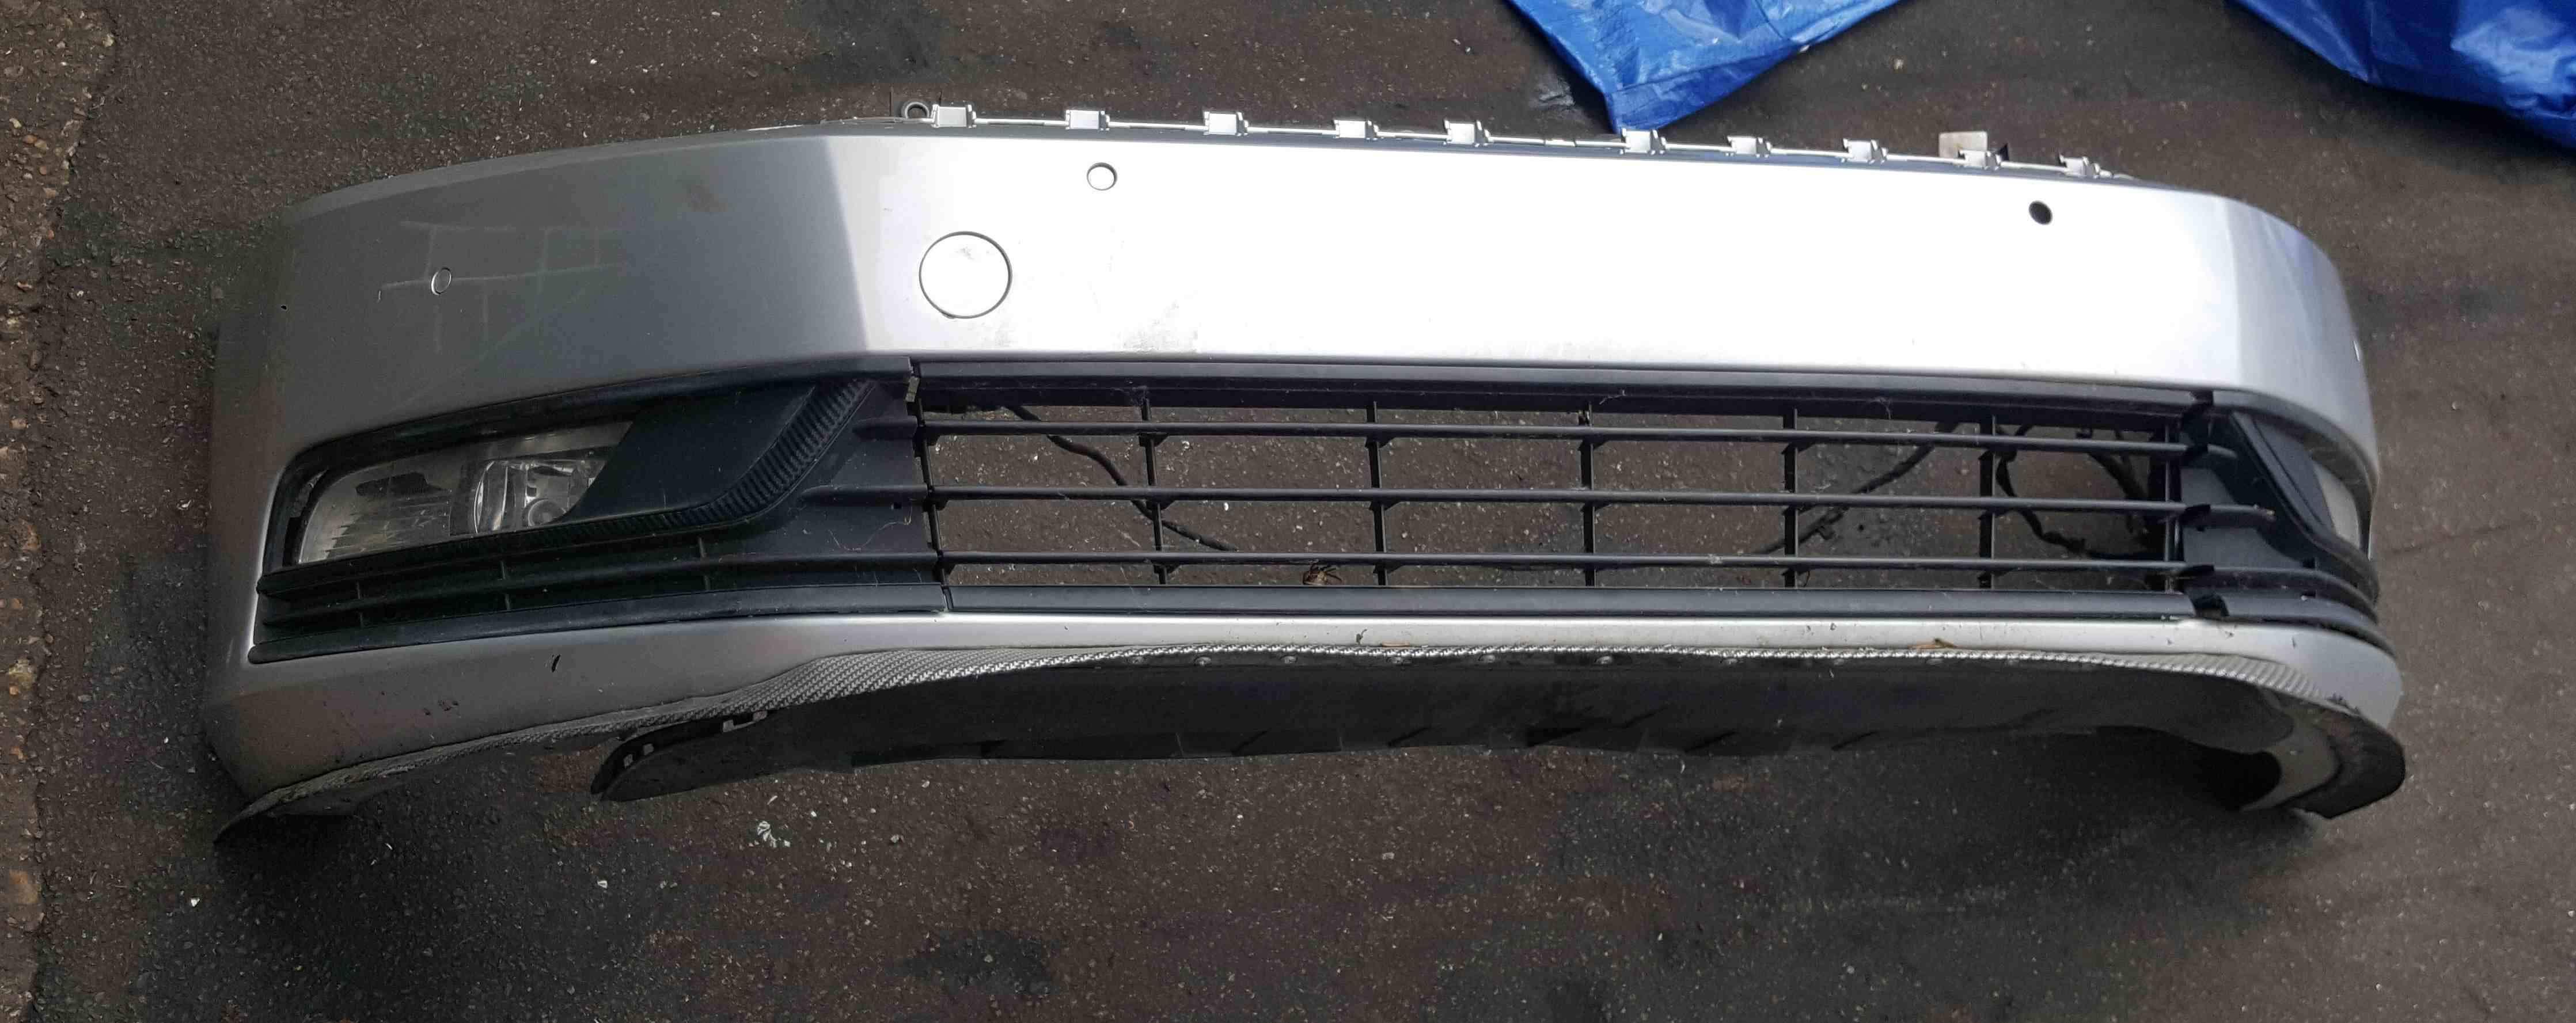 Volkswagen Passat B7 2010-2015 Front Bumper Silver LA7W